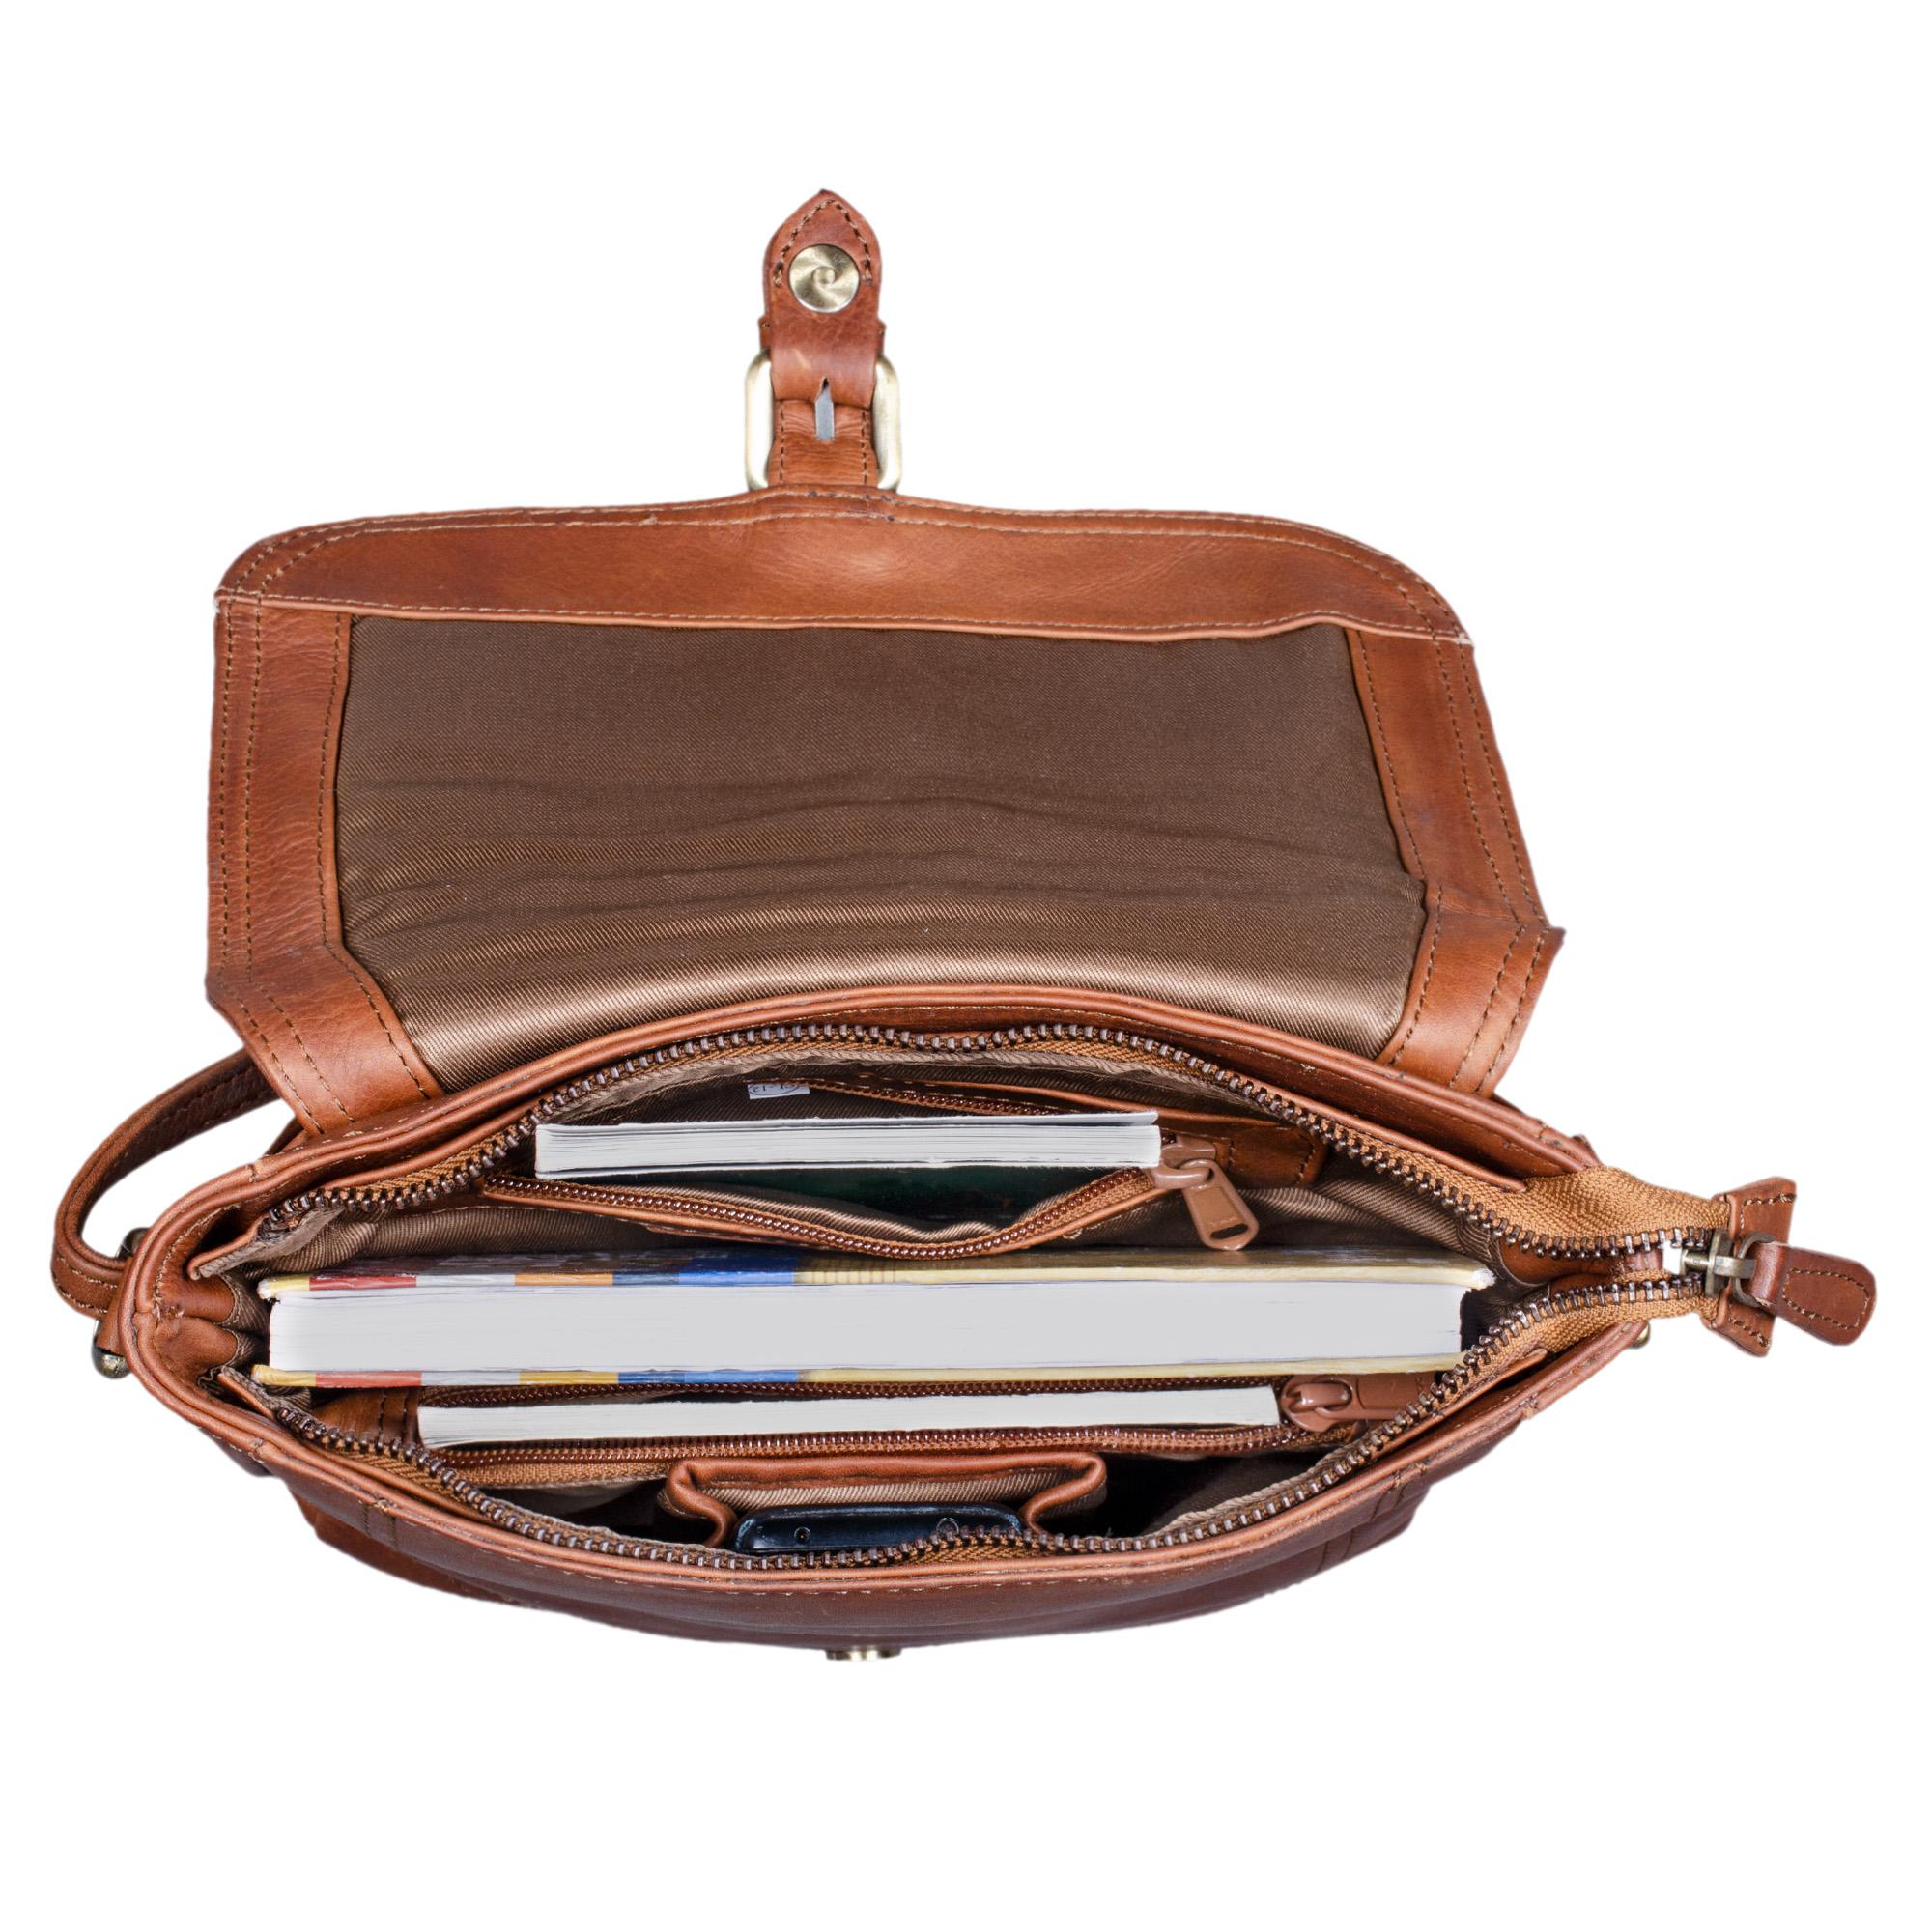 Leder Handtasche cognac braun